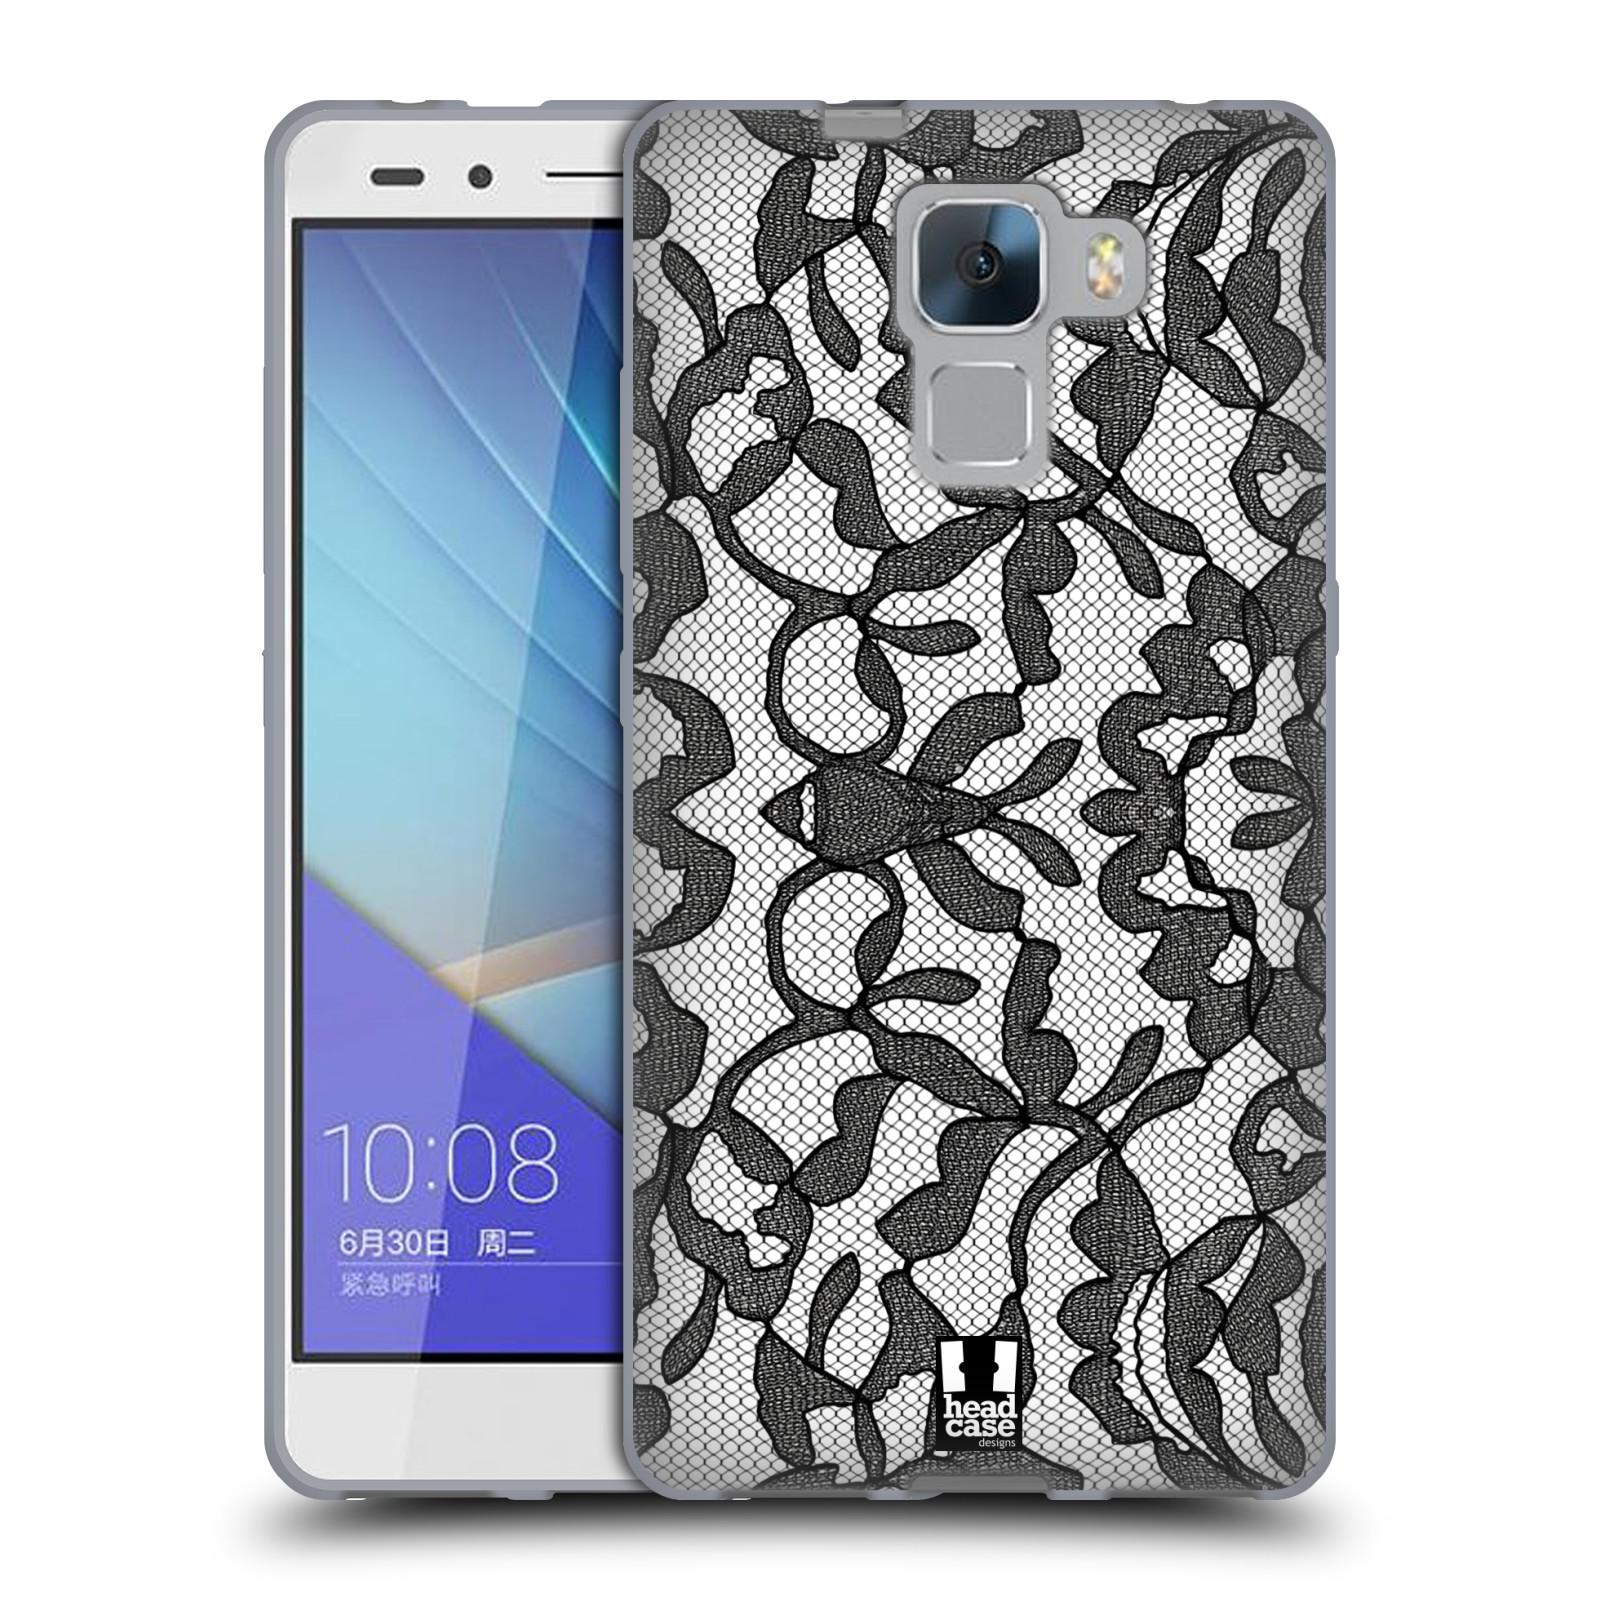 Silikonové pouzdro na mobil Honor 7 HEAD CASE LEAFY KRAJKA (Silikonový kryt či obal na mobilní telefon Huawei Honor 7)